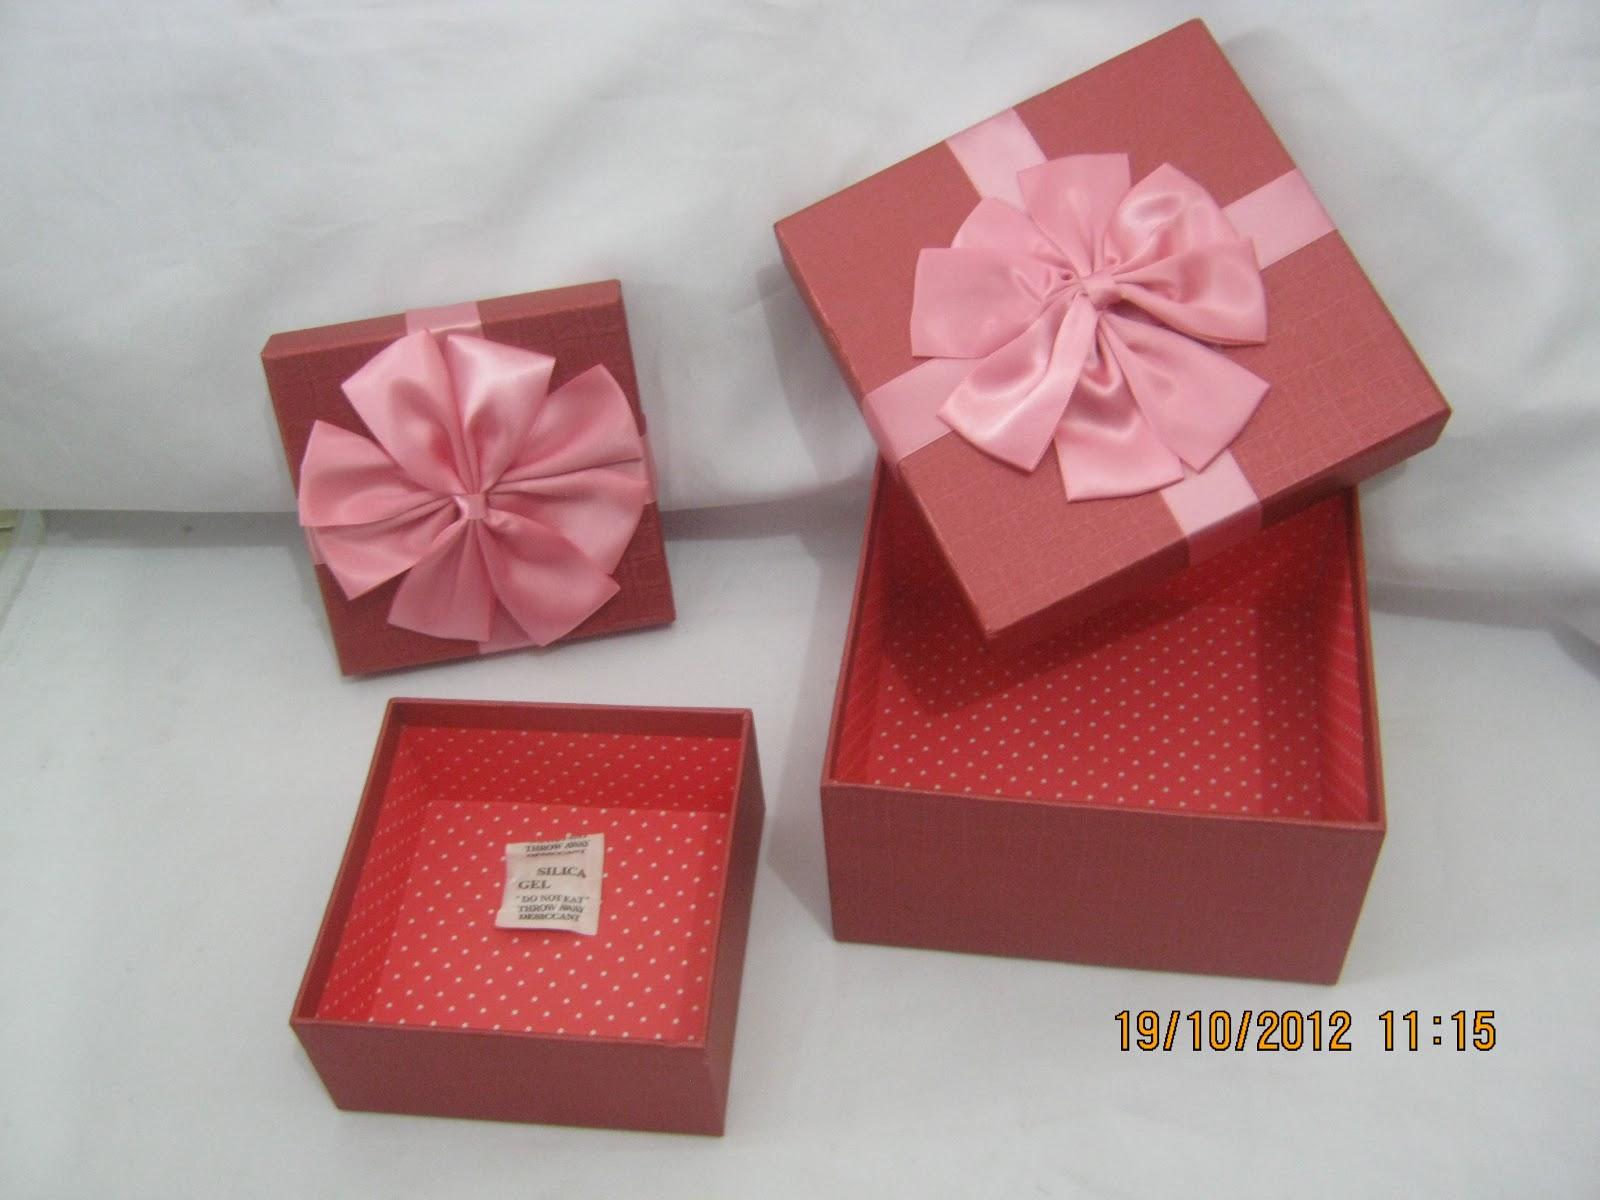 Singapore Gift Boxes: January 2013